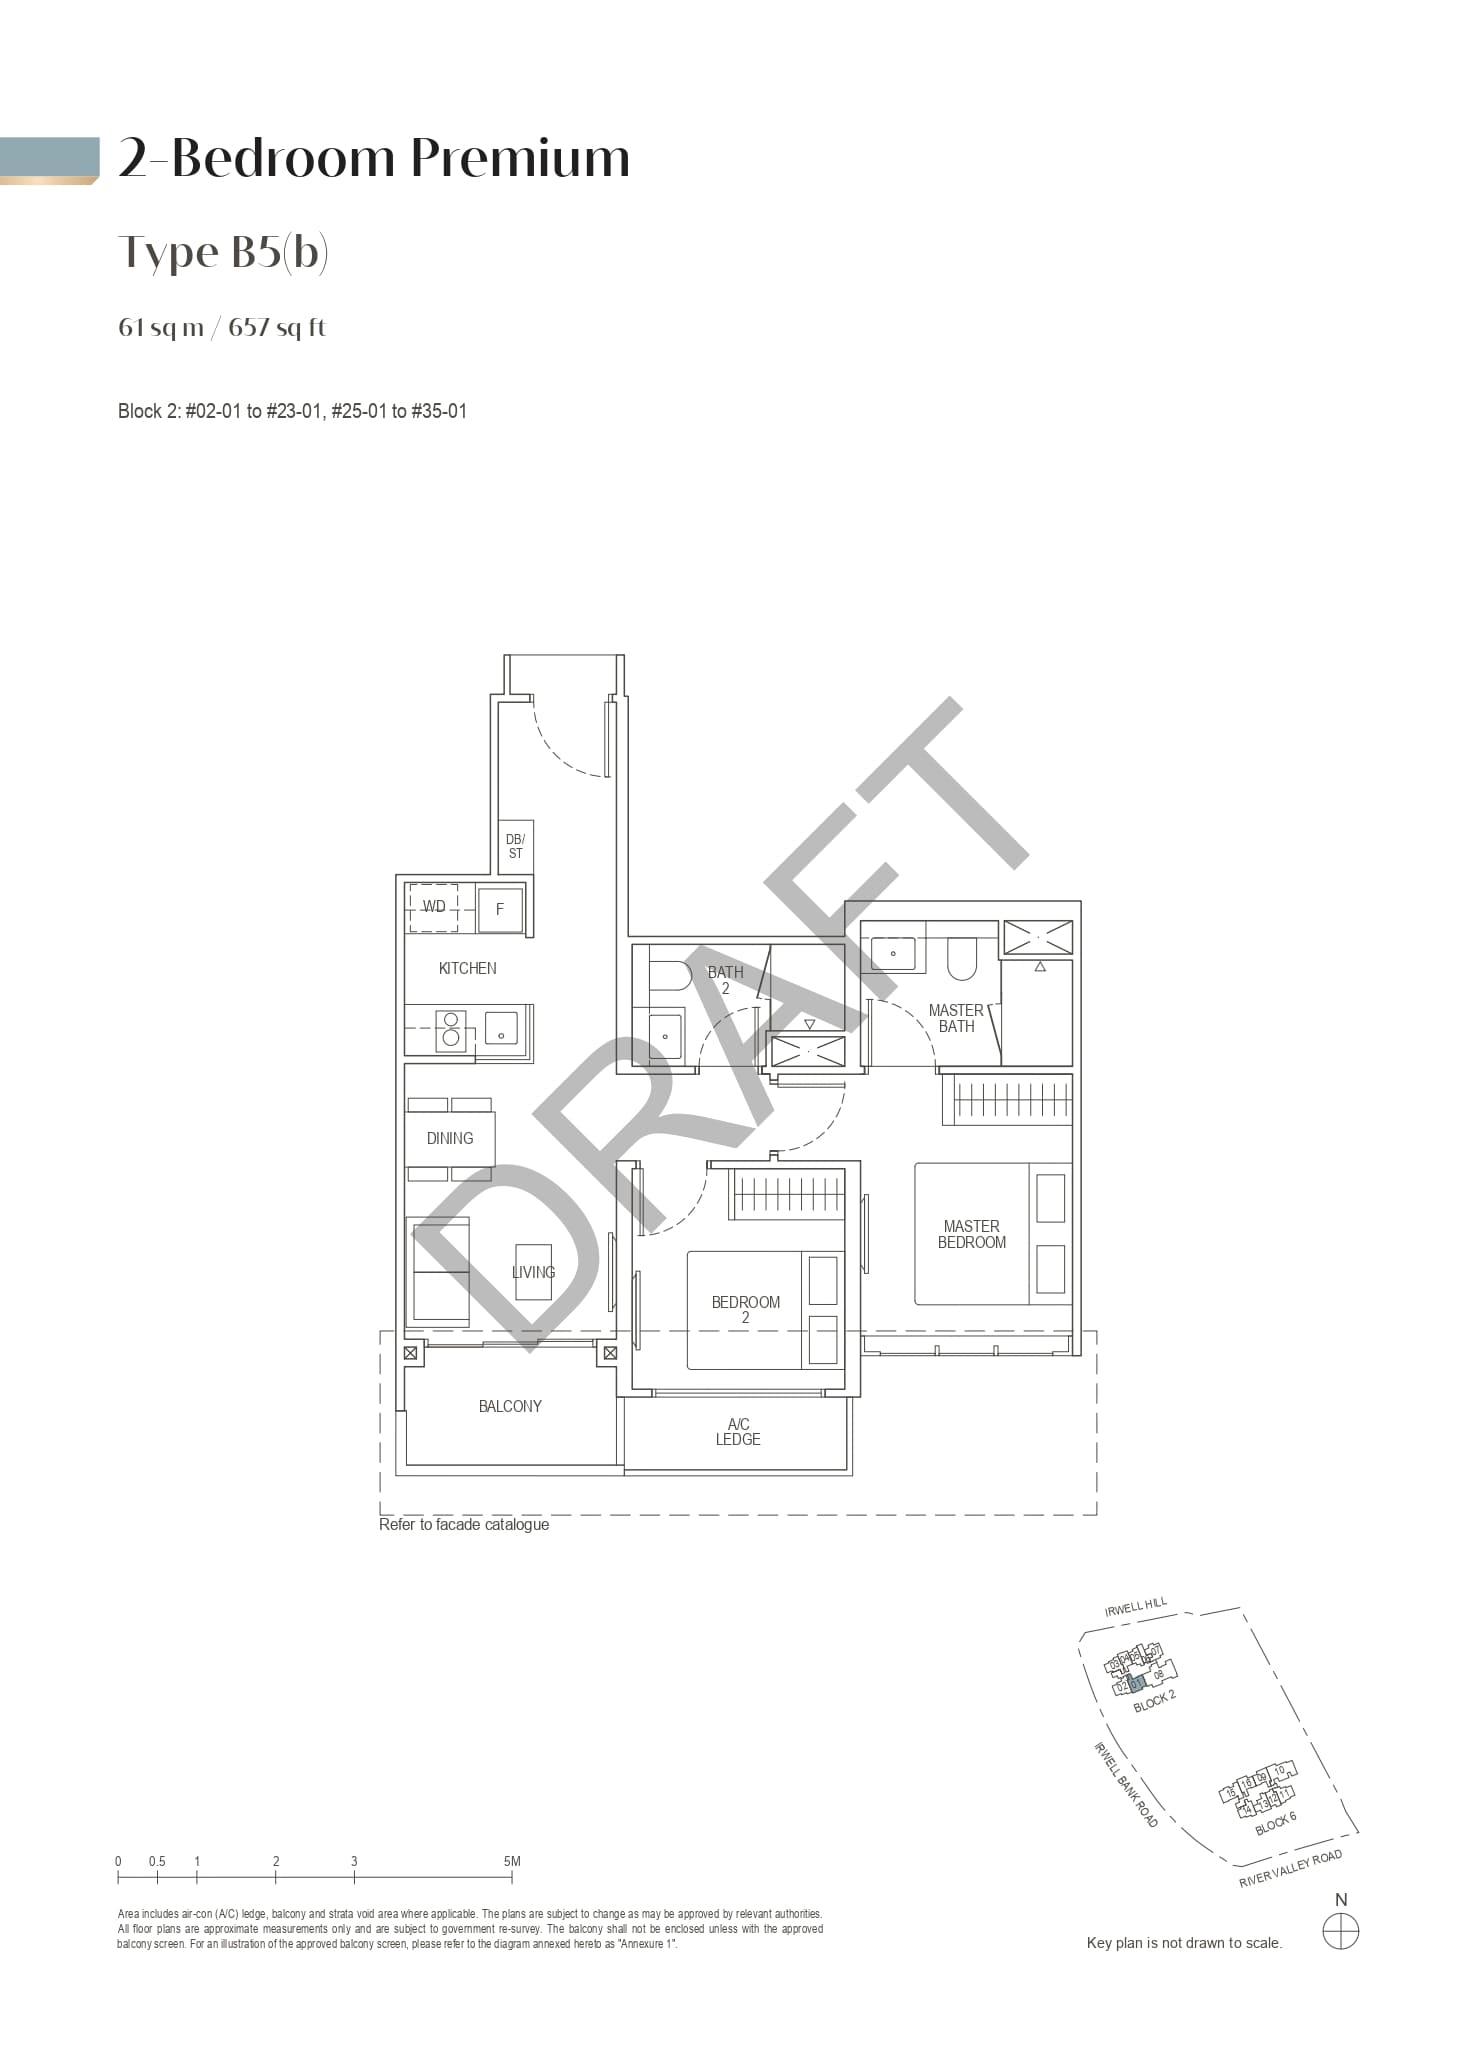 irwell-hill-residences-floor-plan-2-bedroom-premium-type-b5b